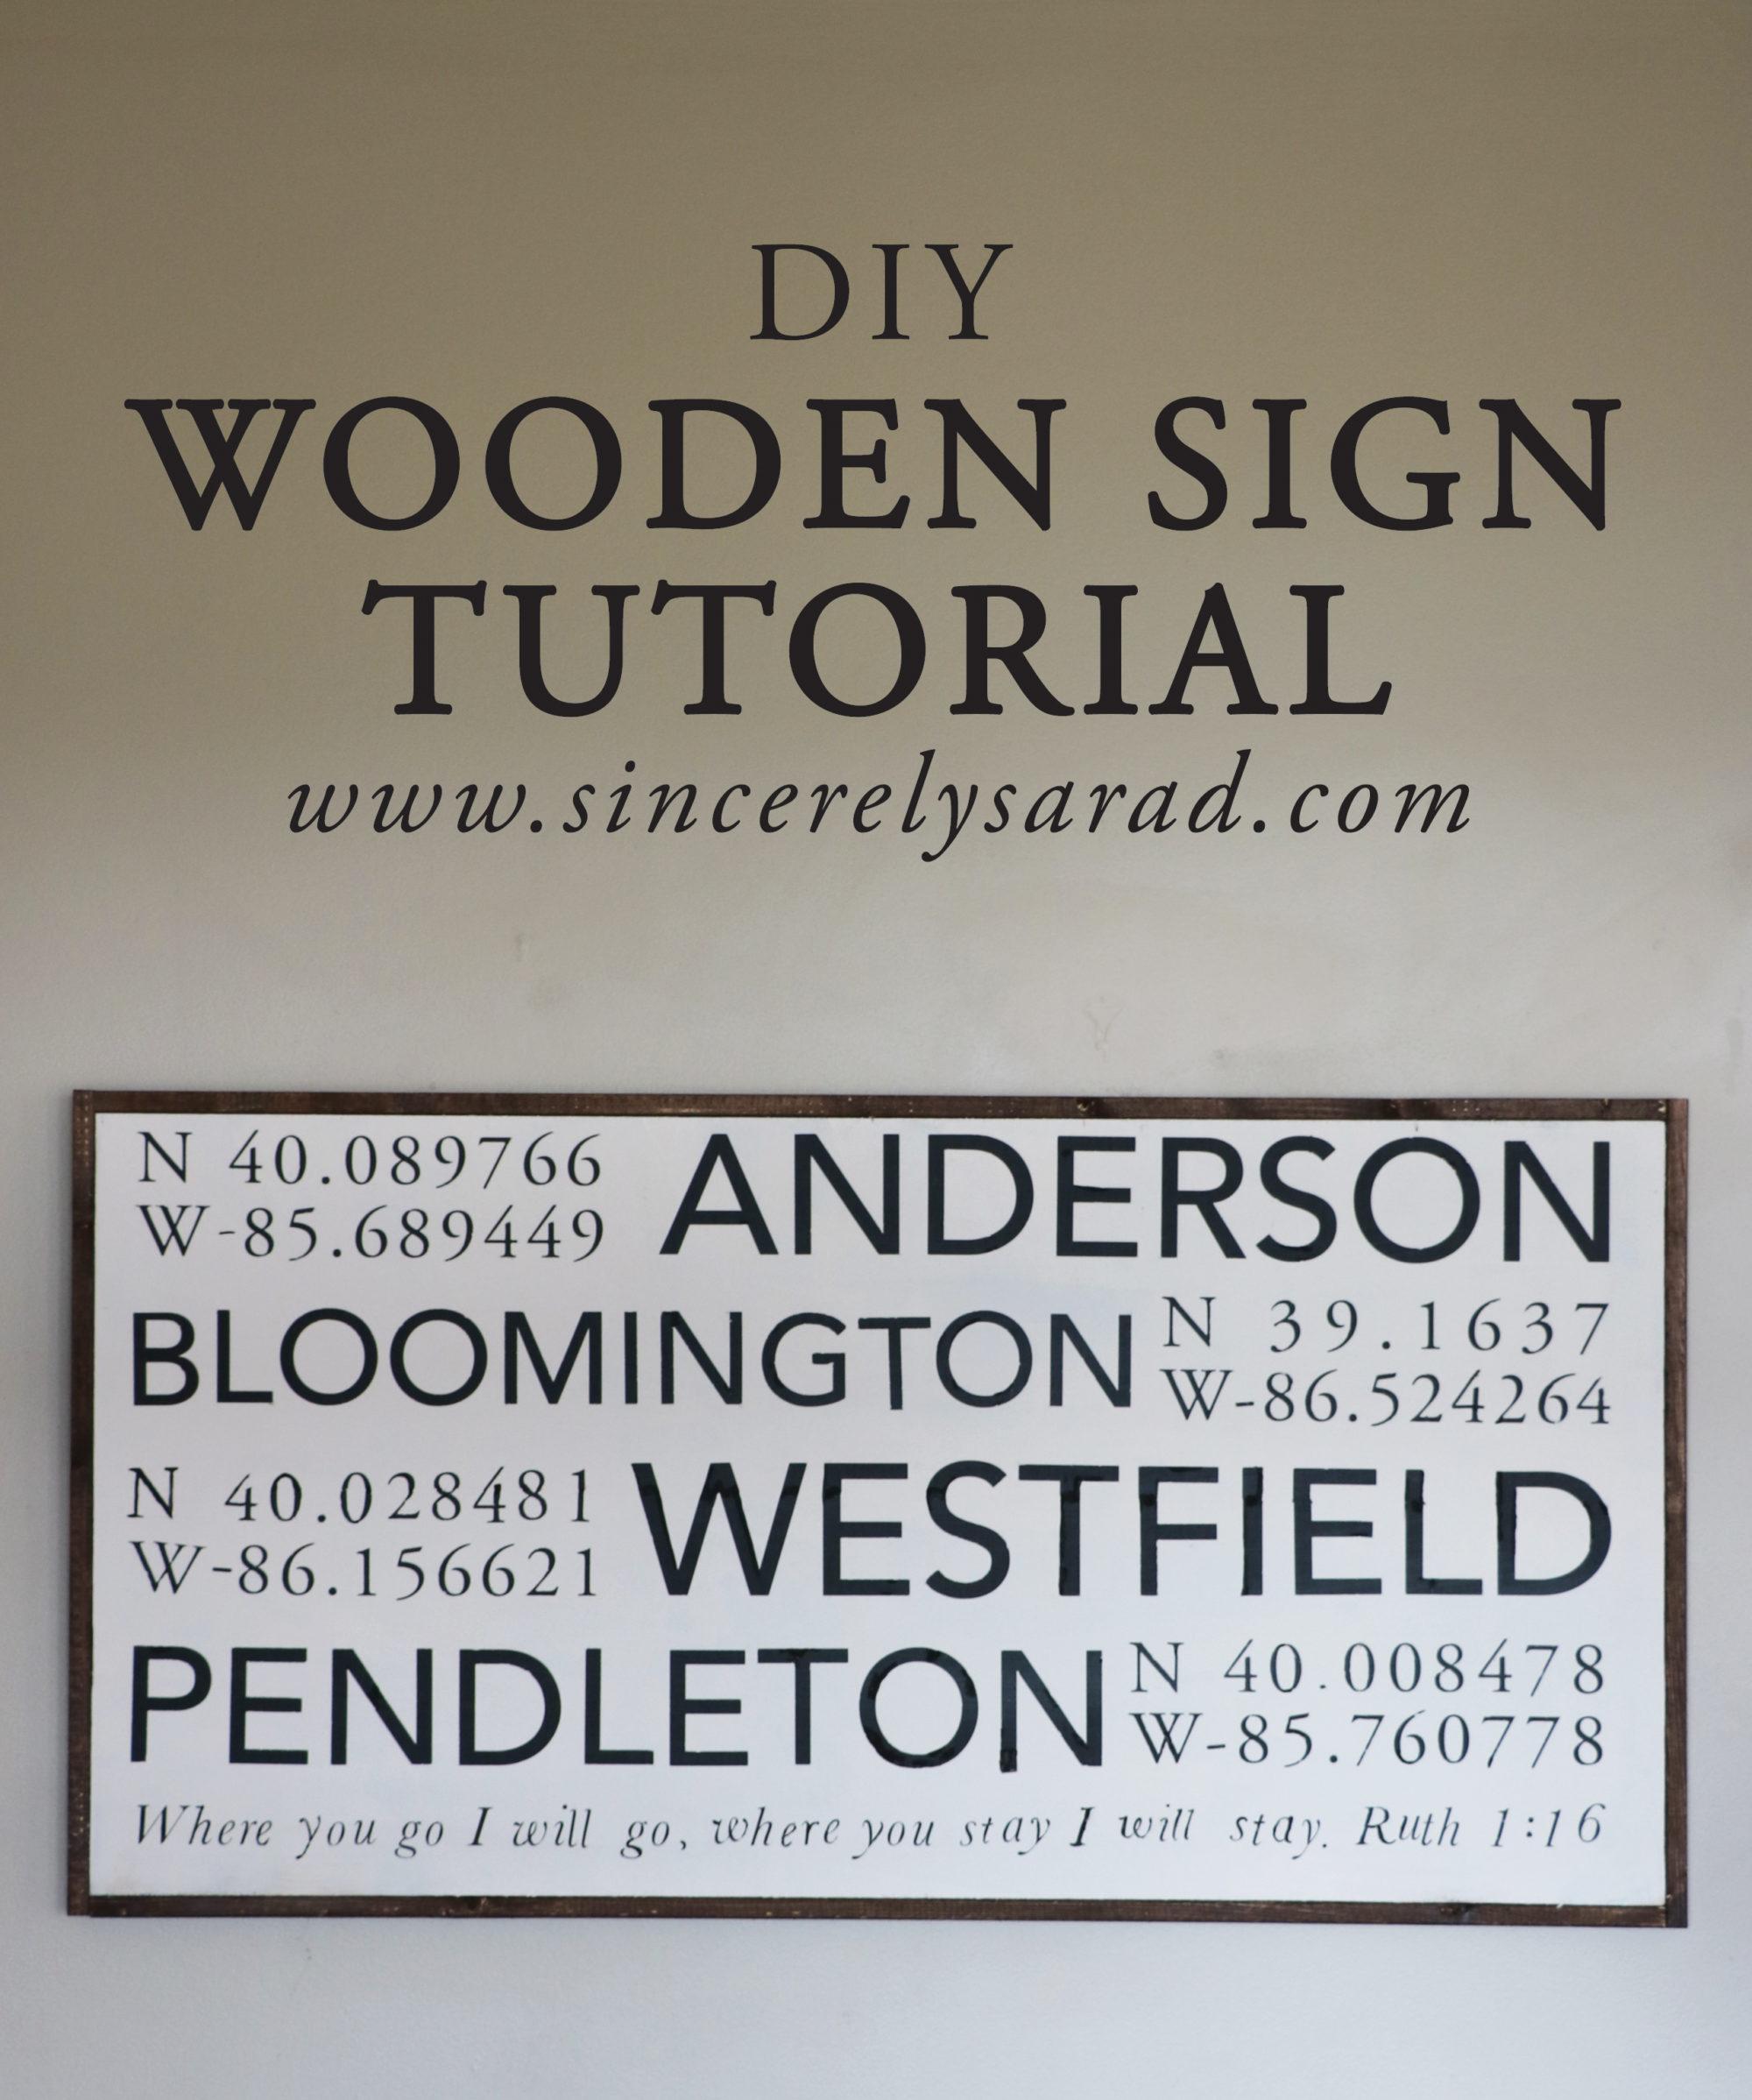 DIY Wooden Sign Tutorial